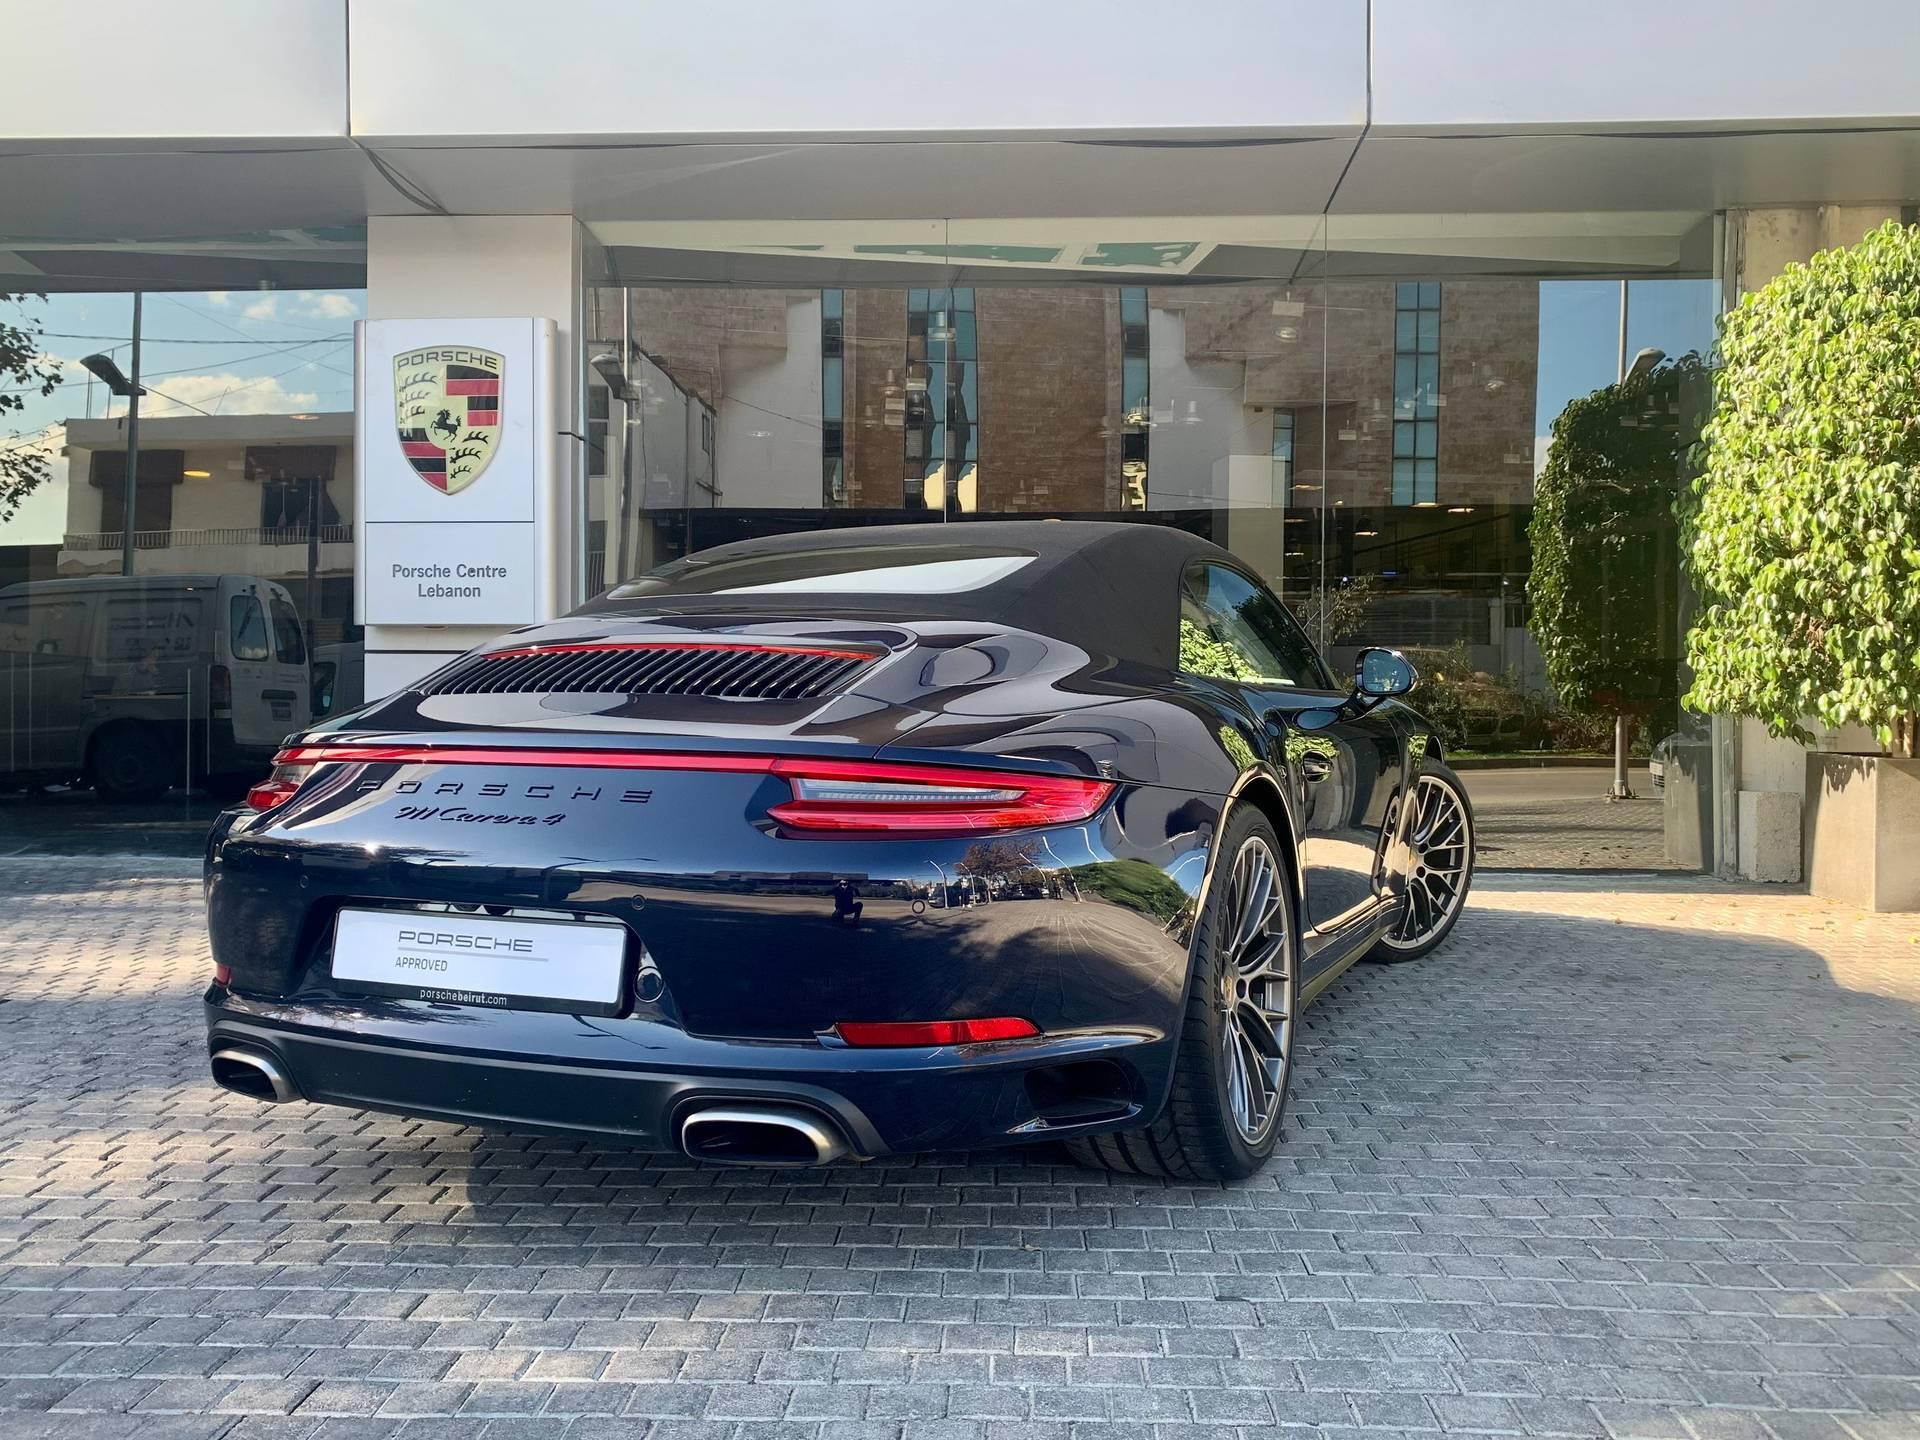 2017 Porsche 911 Carrera 4 Cabriolet – 5